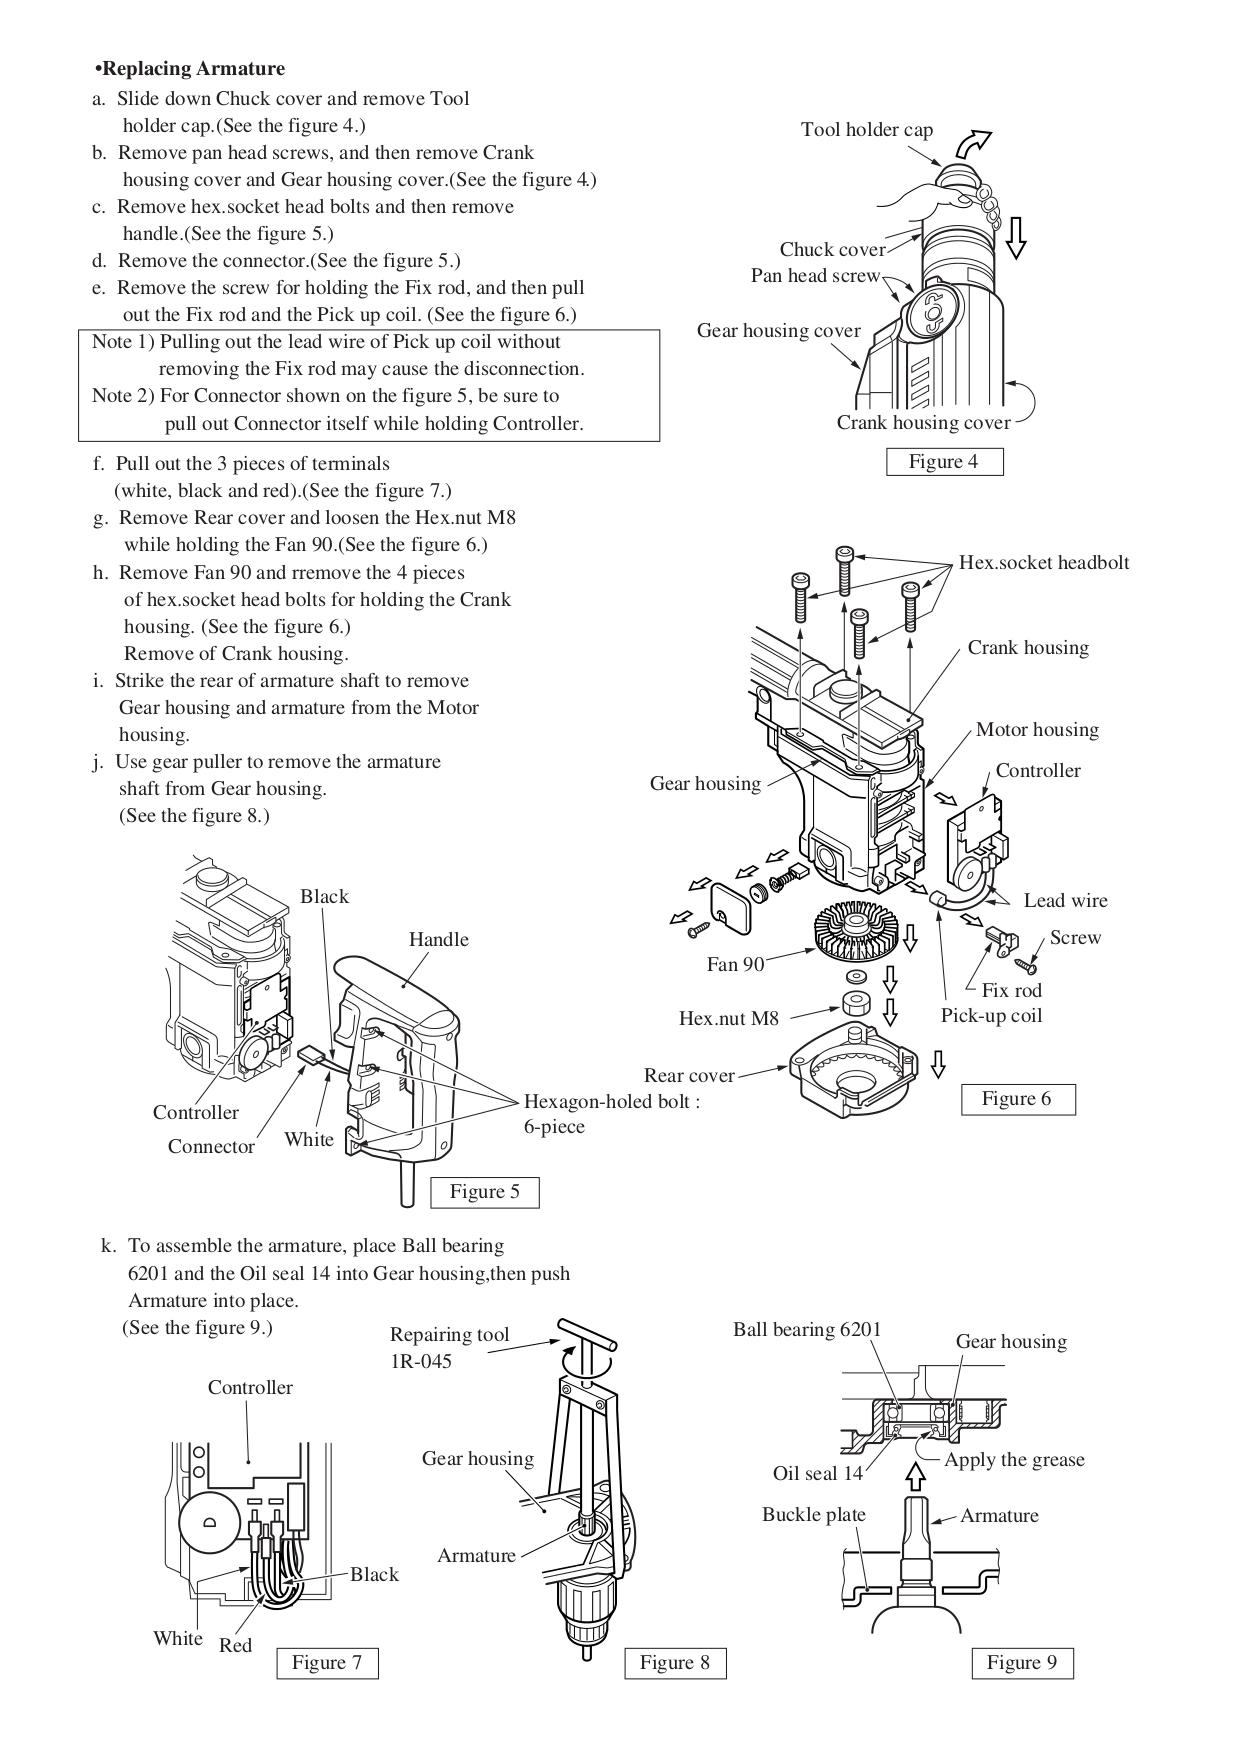 Перфоратор макита hr4000c схема сборки